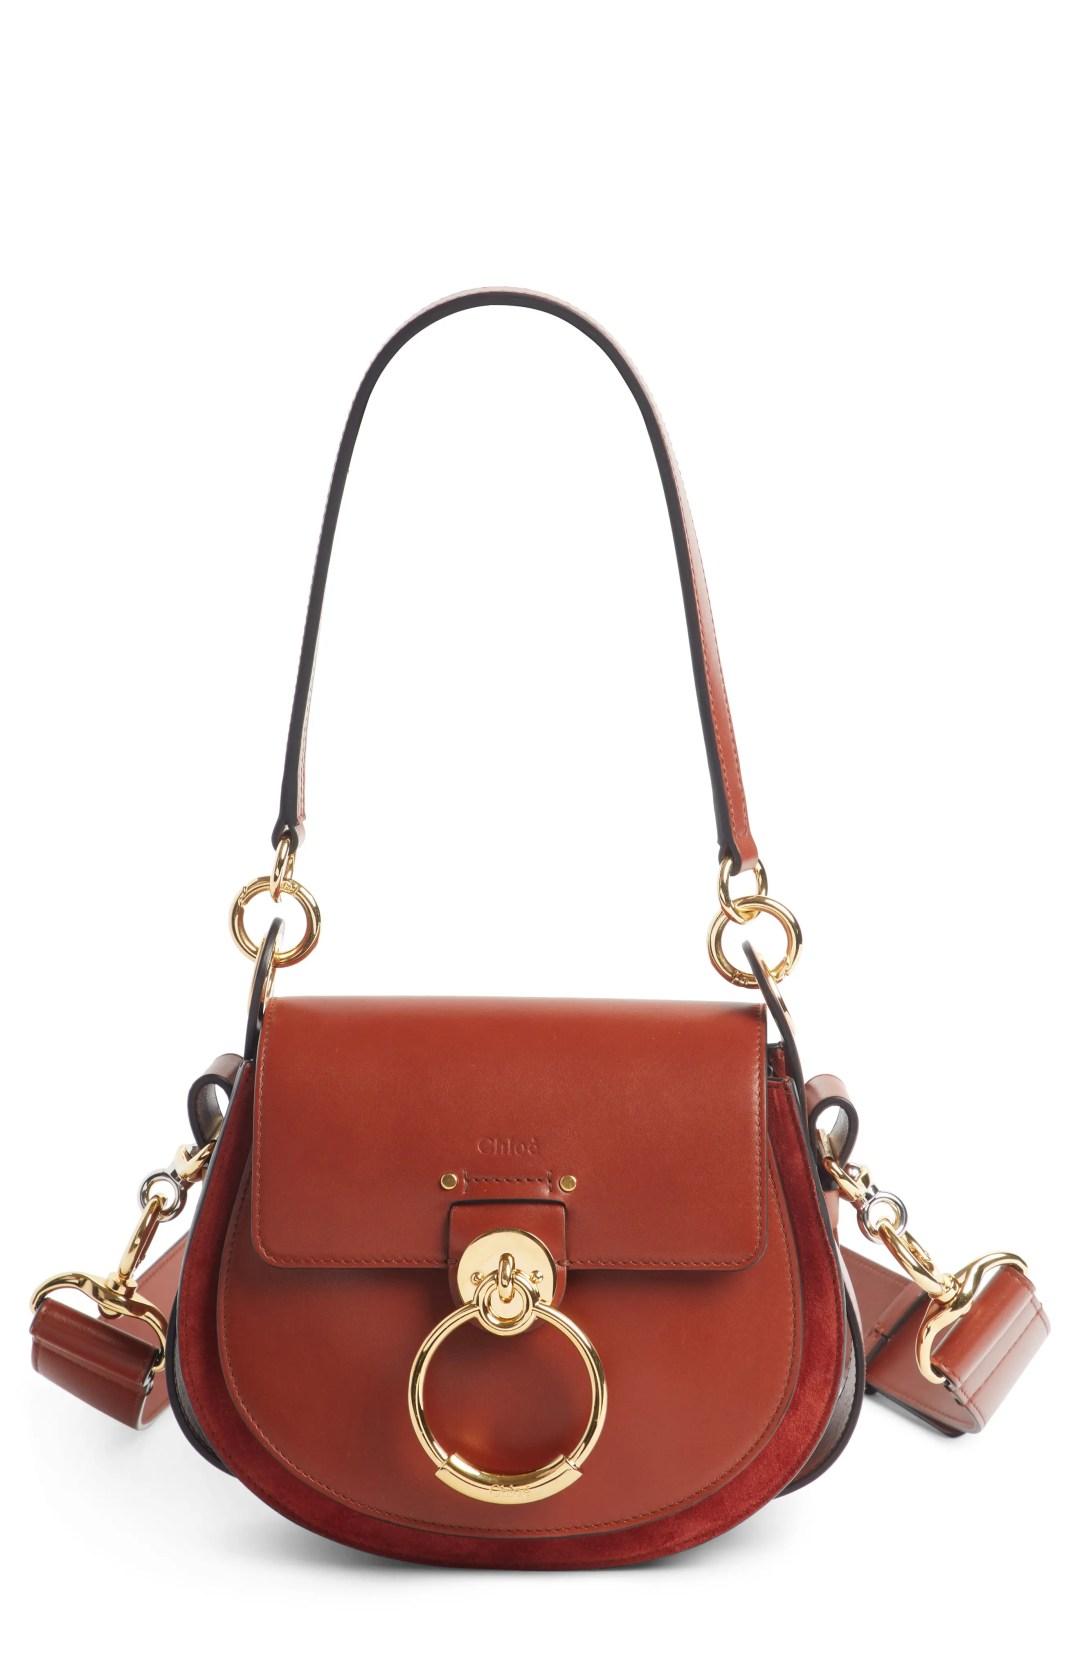 9bfb3b56f0ad Chloé Small Tess Calfskin Leather Shoulder Bag